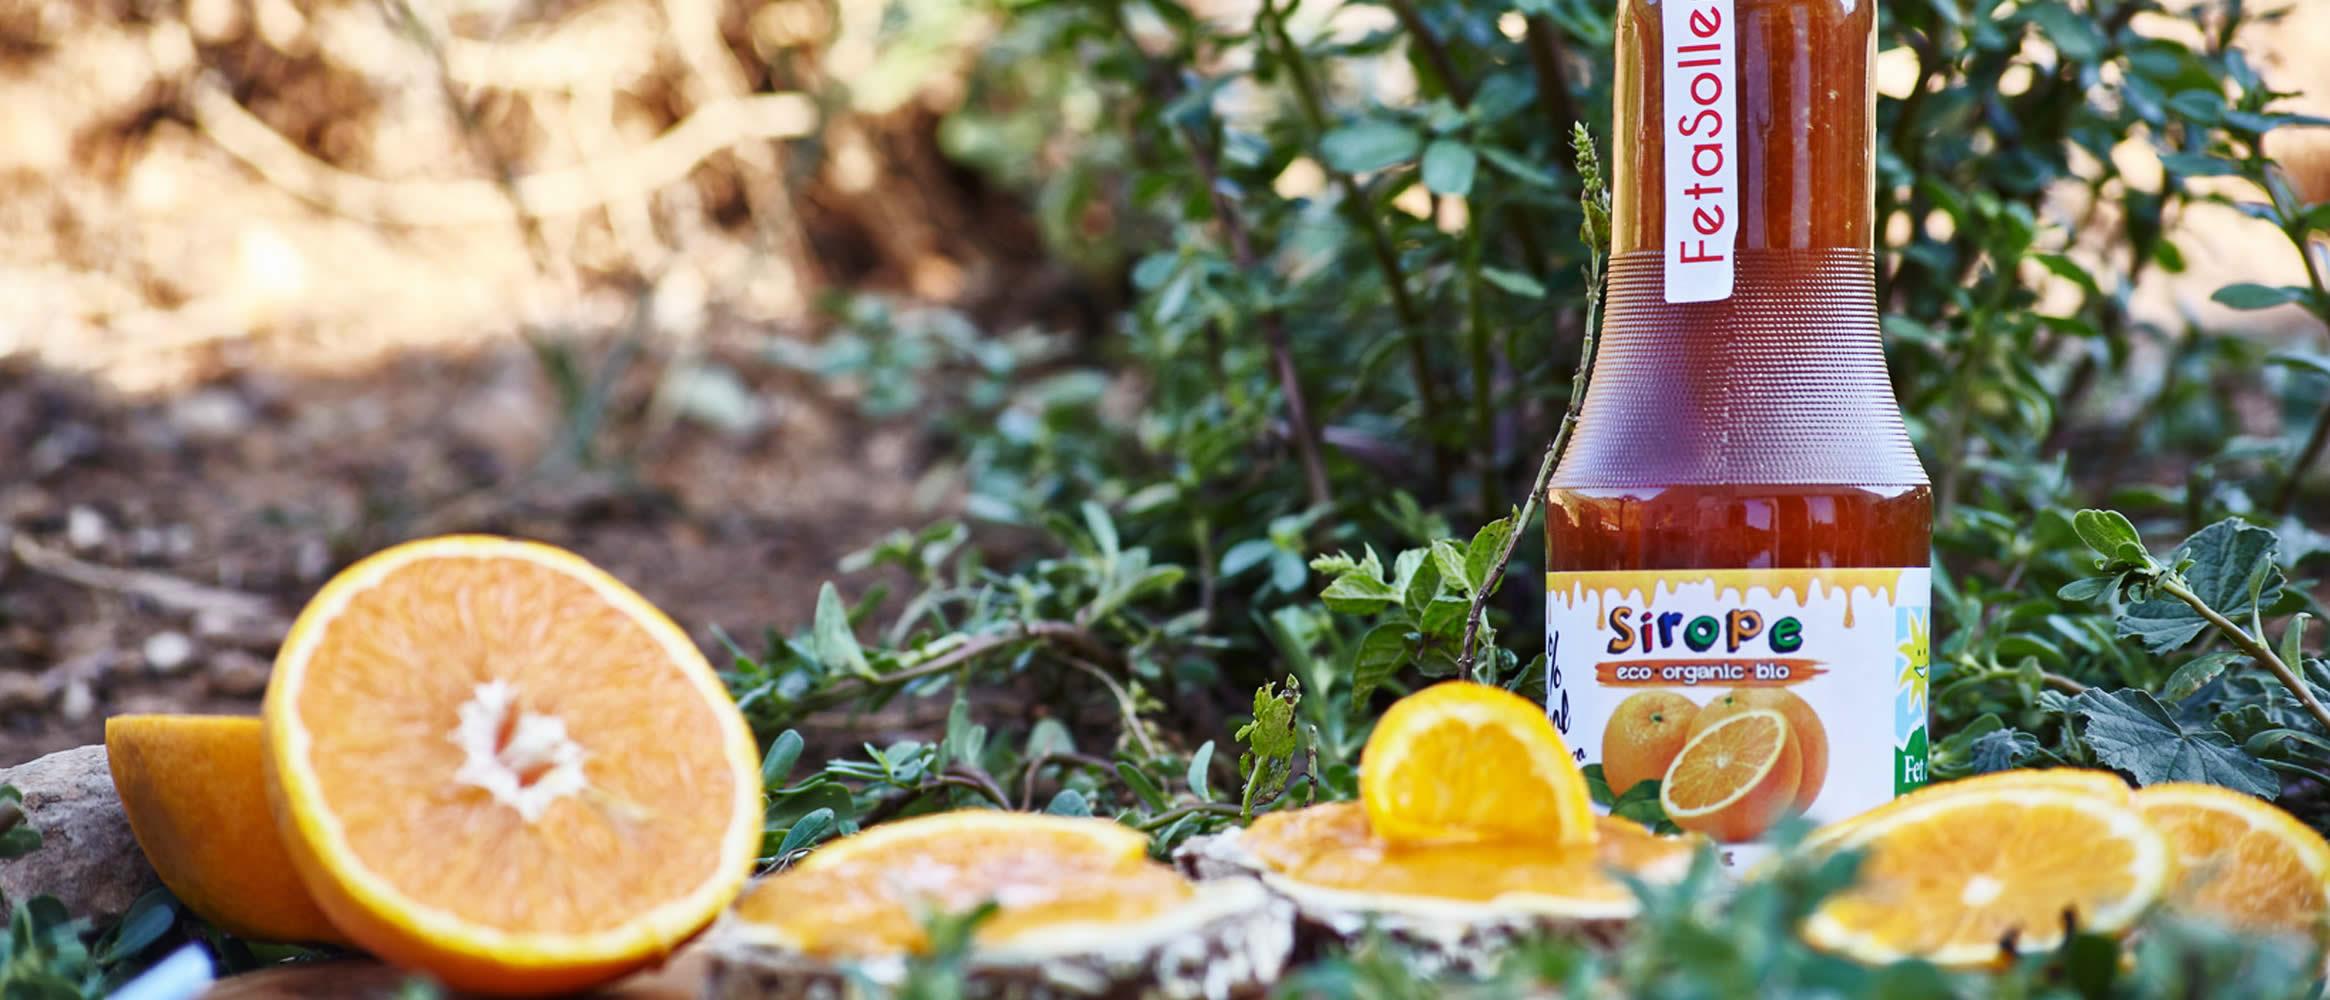 Sirope de Naranja ecológico Fet a Sóller